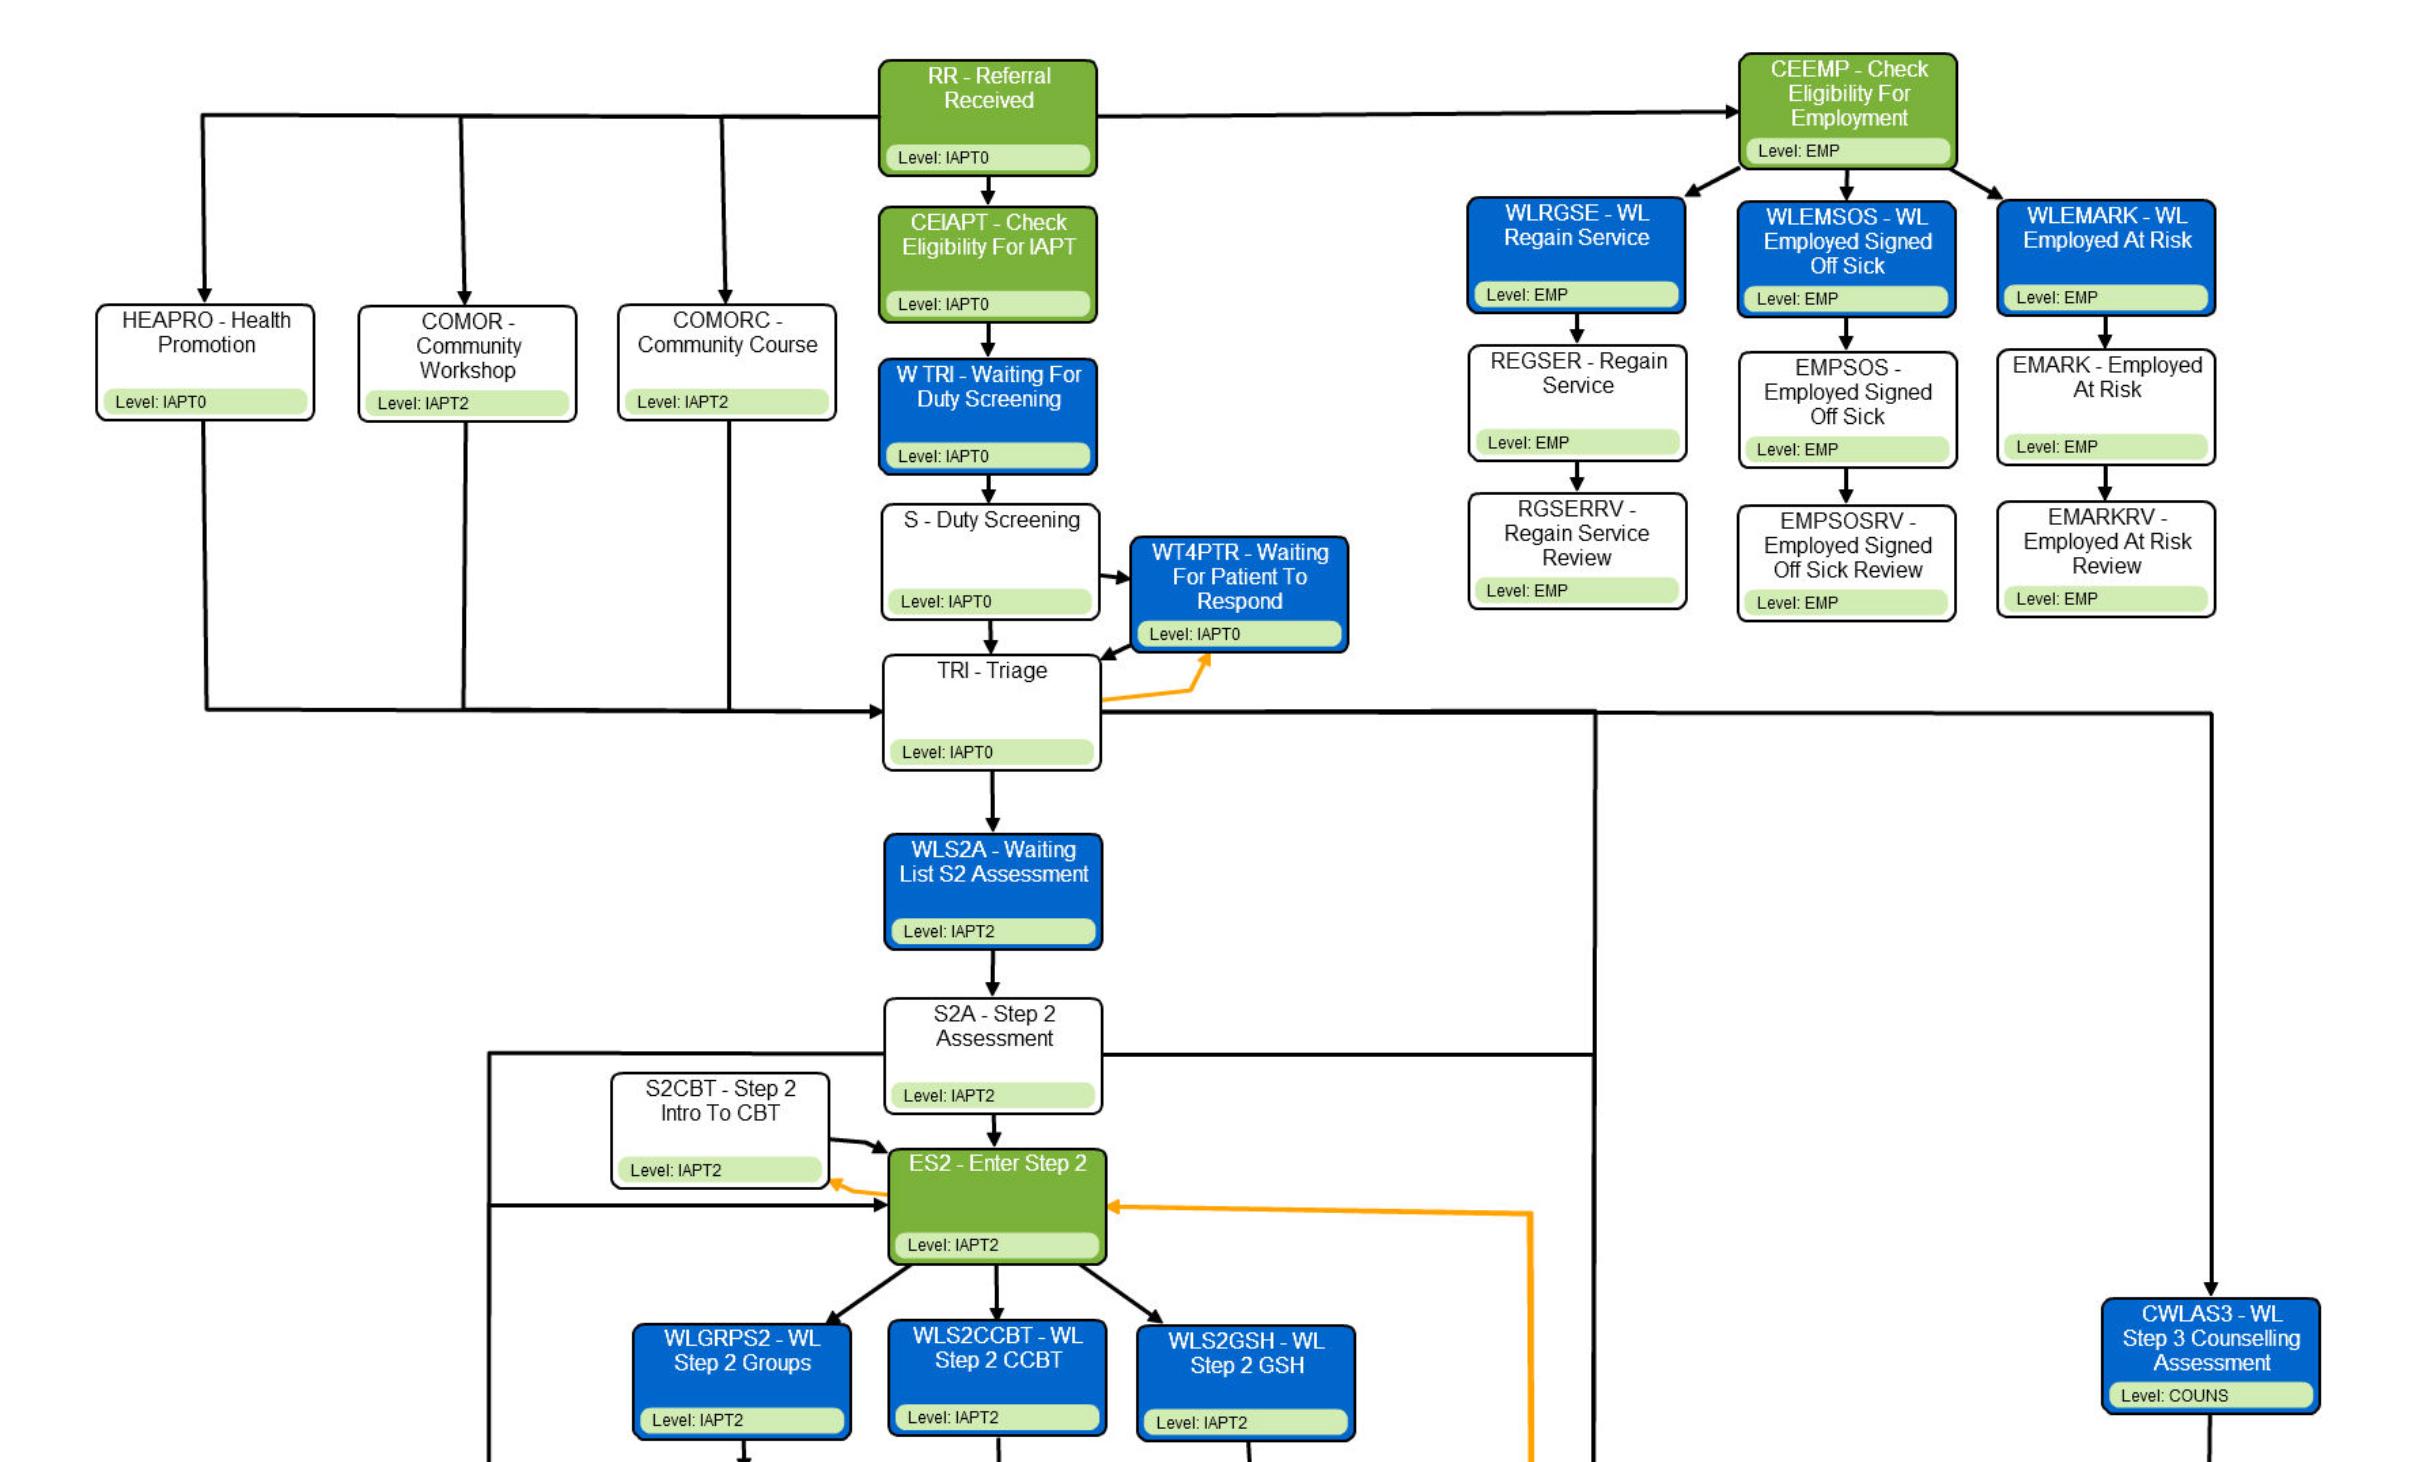 ipatus Care Pathway screen